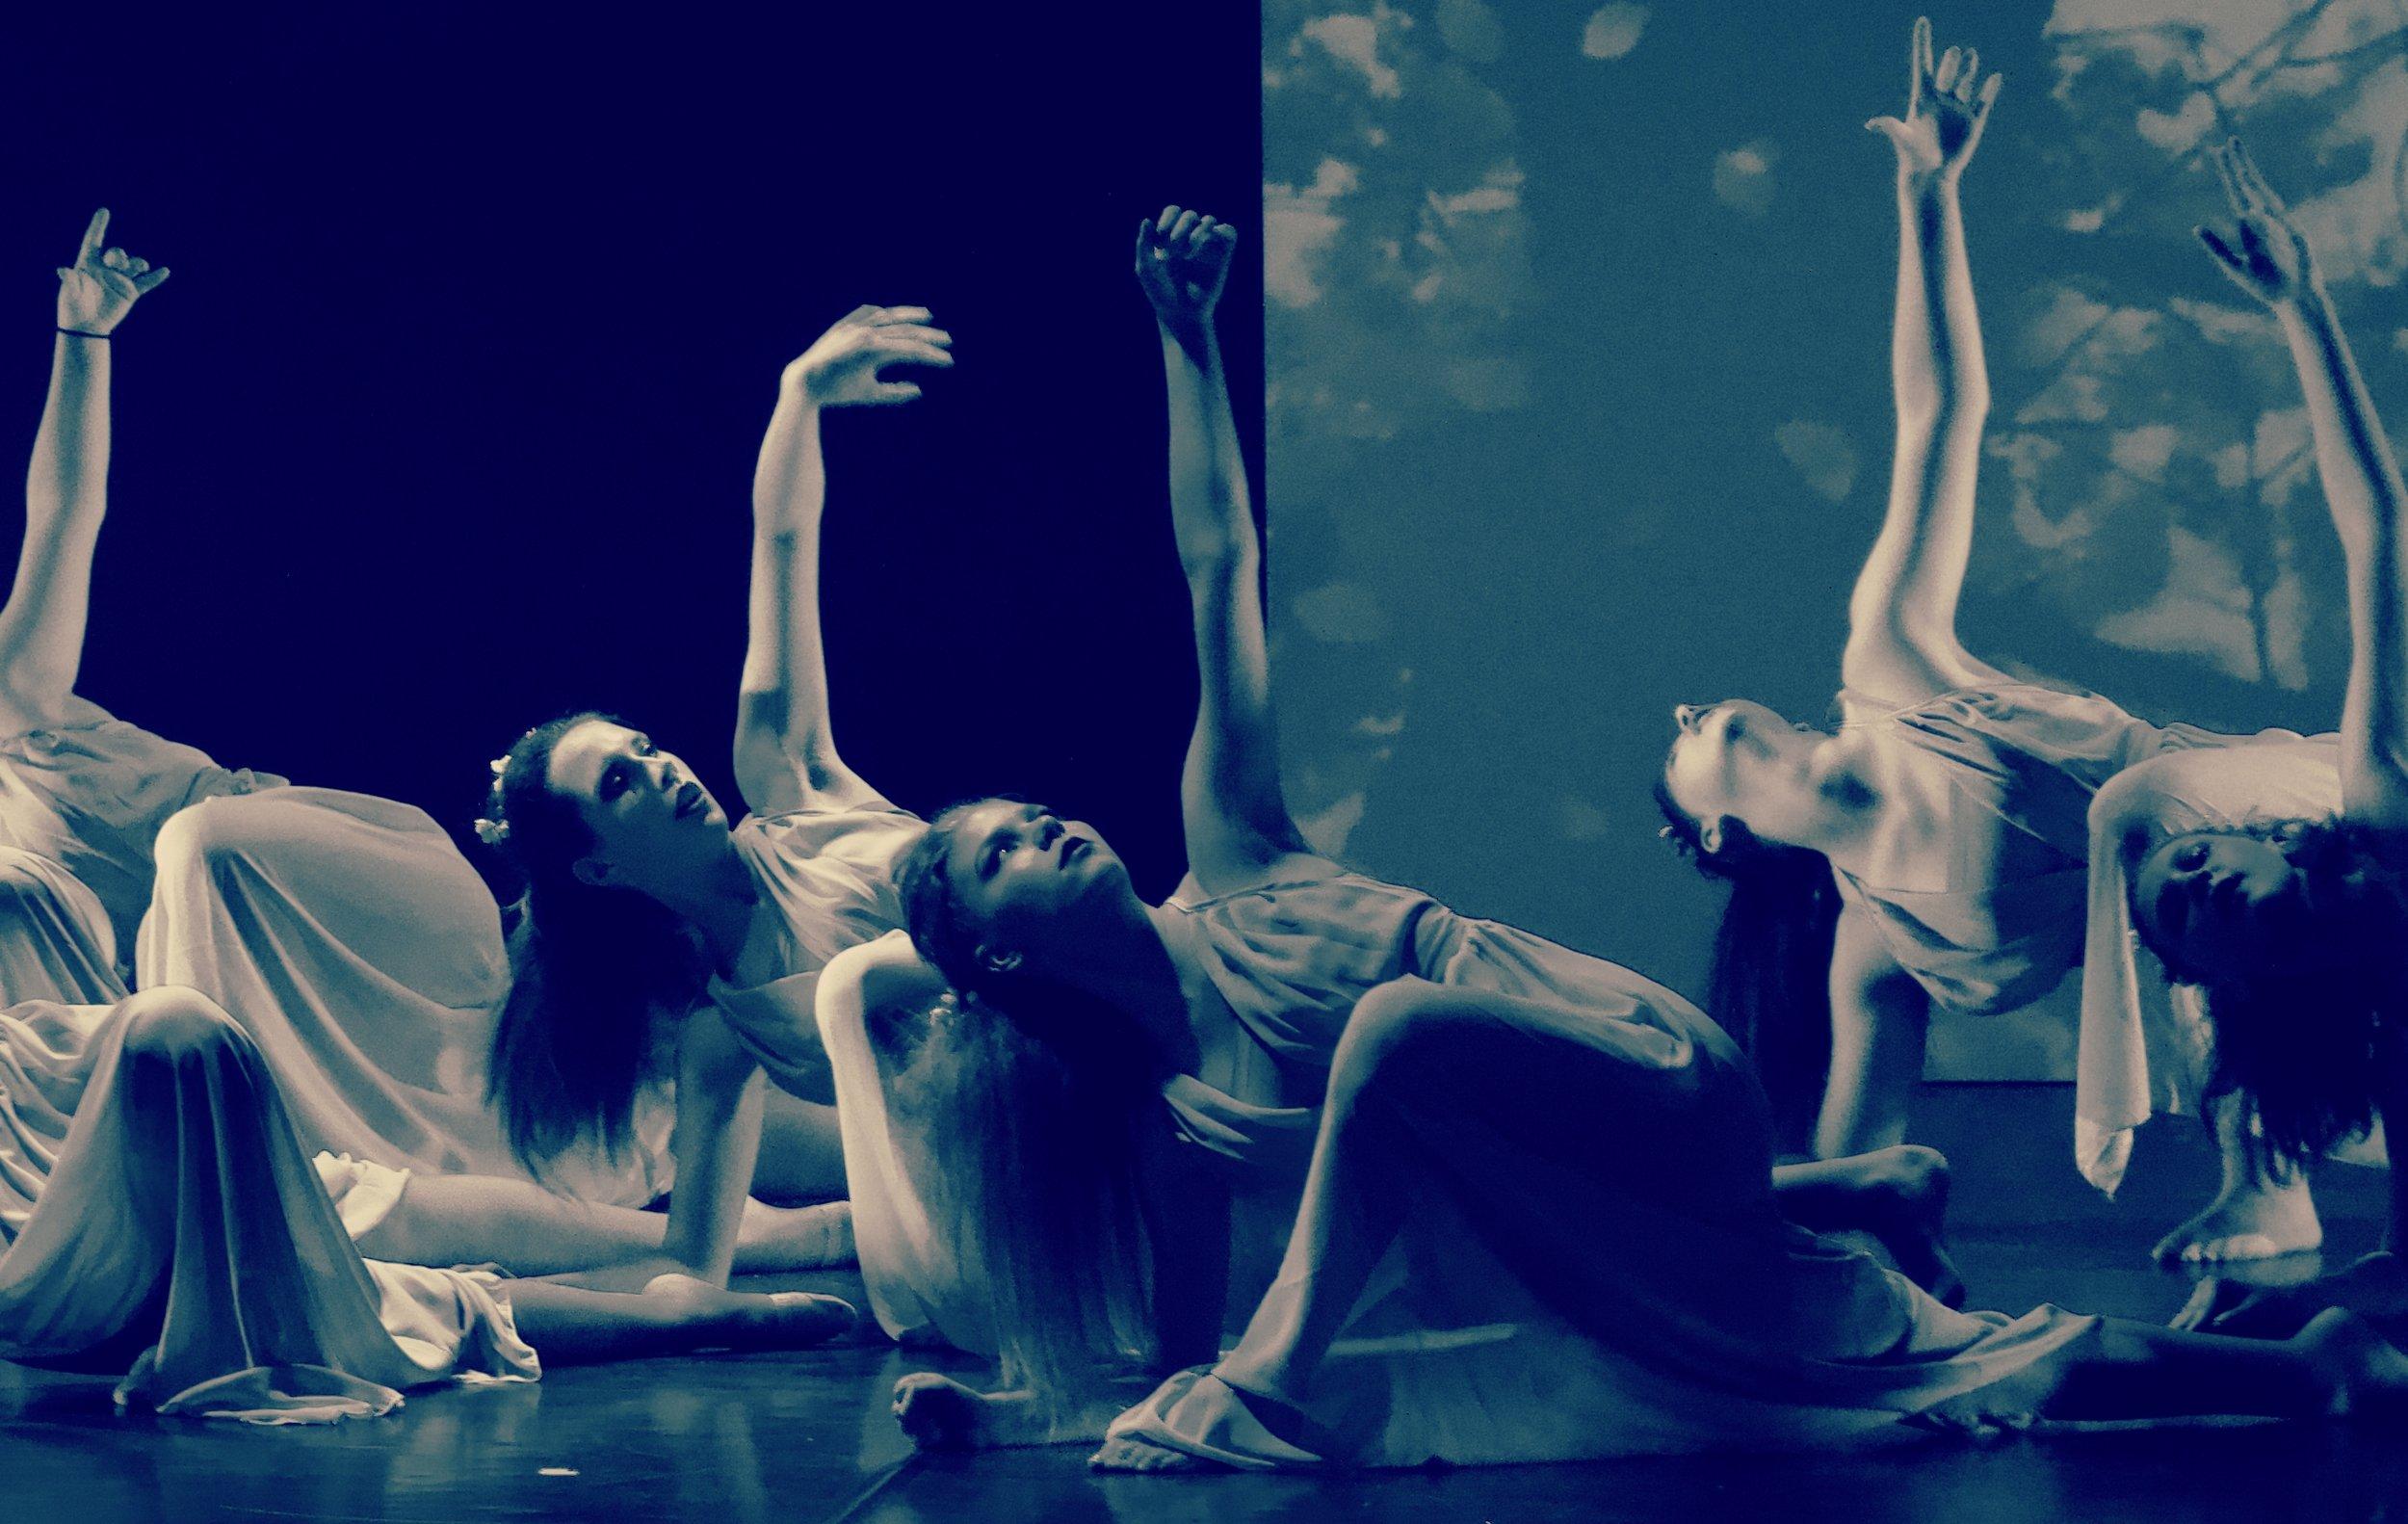 CORSI - JAZZ DANCE - HIP HOP - DANZA CLASSICA - VIDEO DANCE - HEELS - LYRICAL JAZZ - BROADWAY DANCE